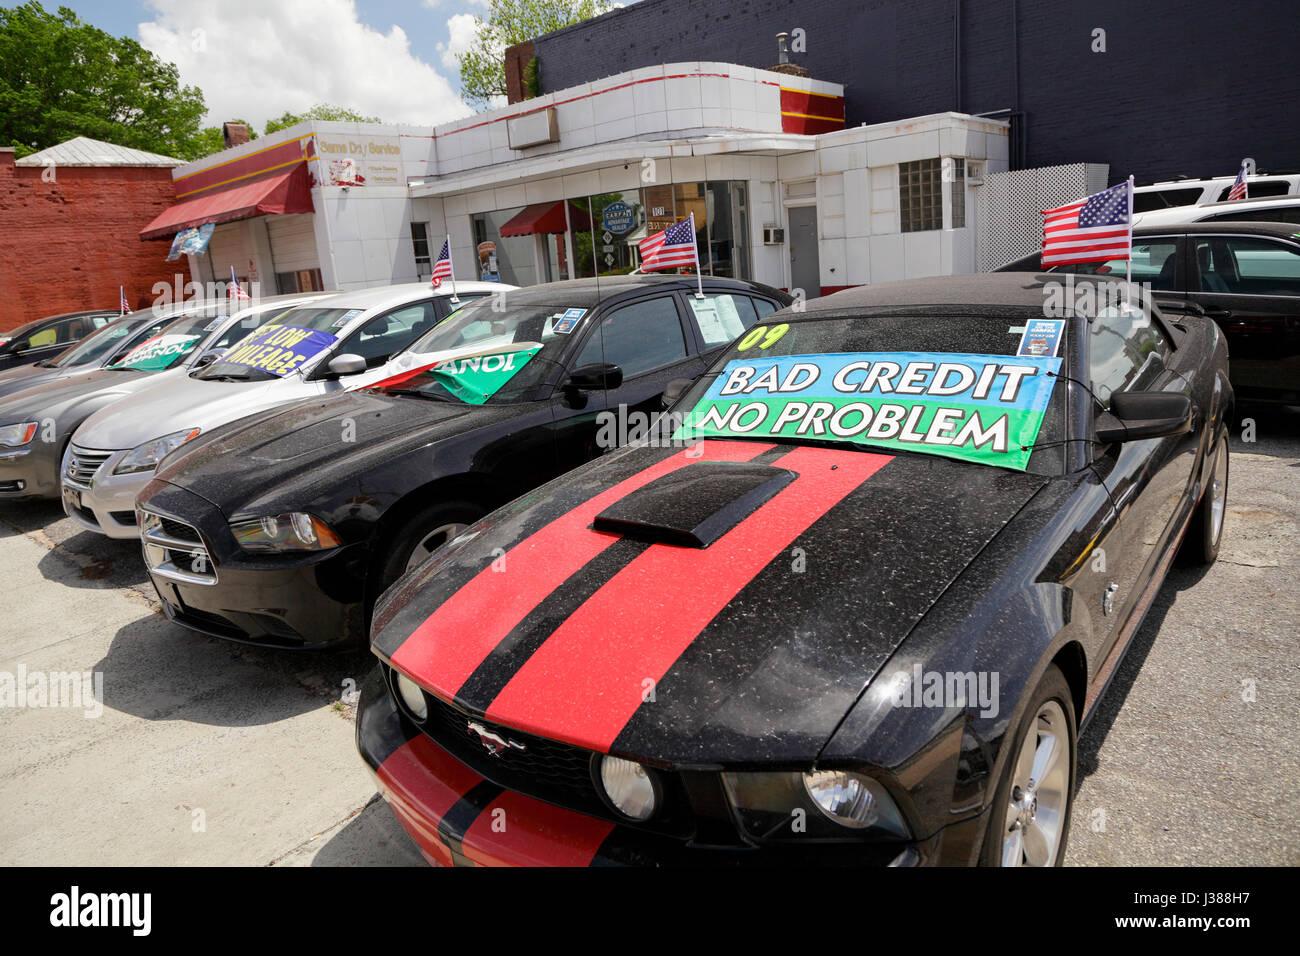 Used cars for sale north carolina usa stock image